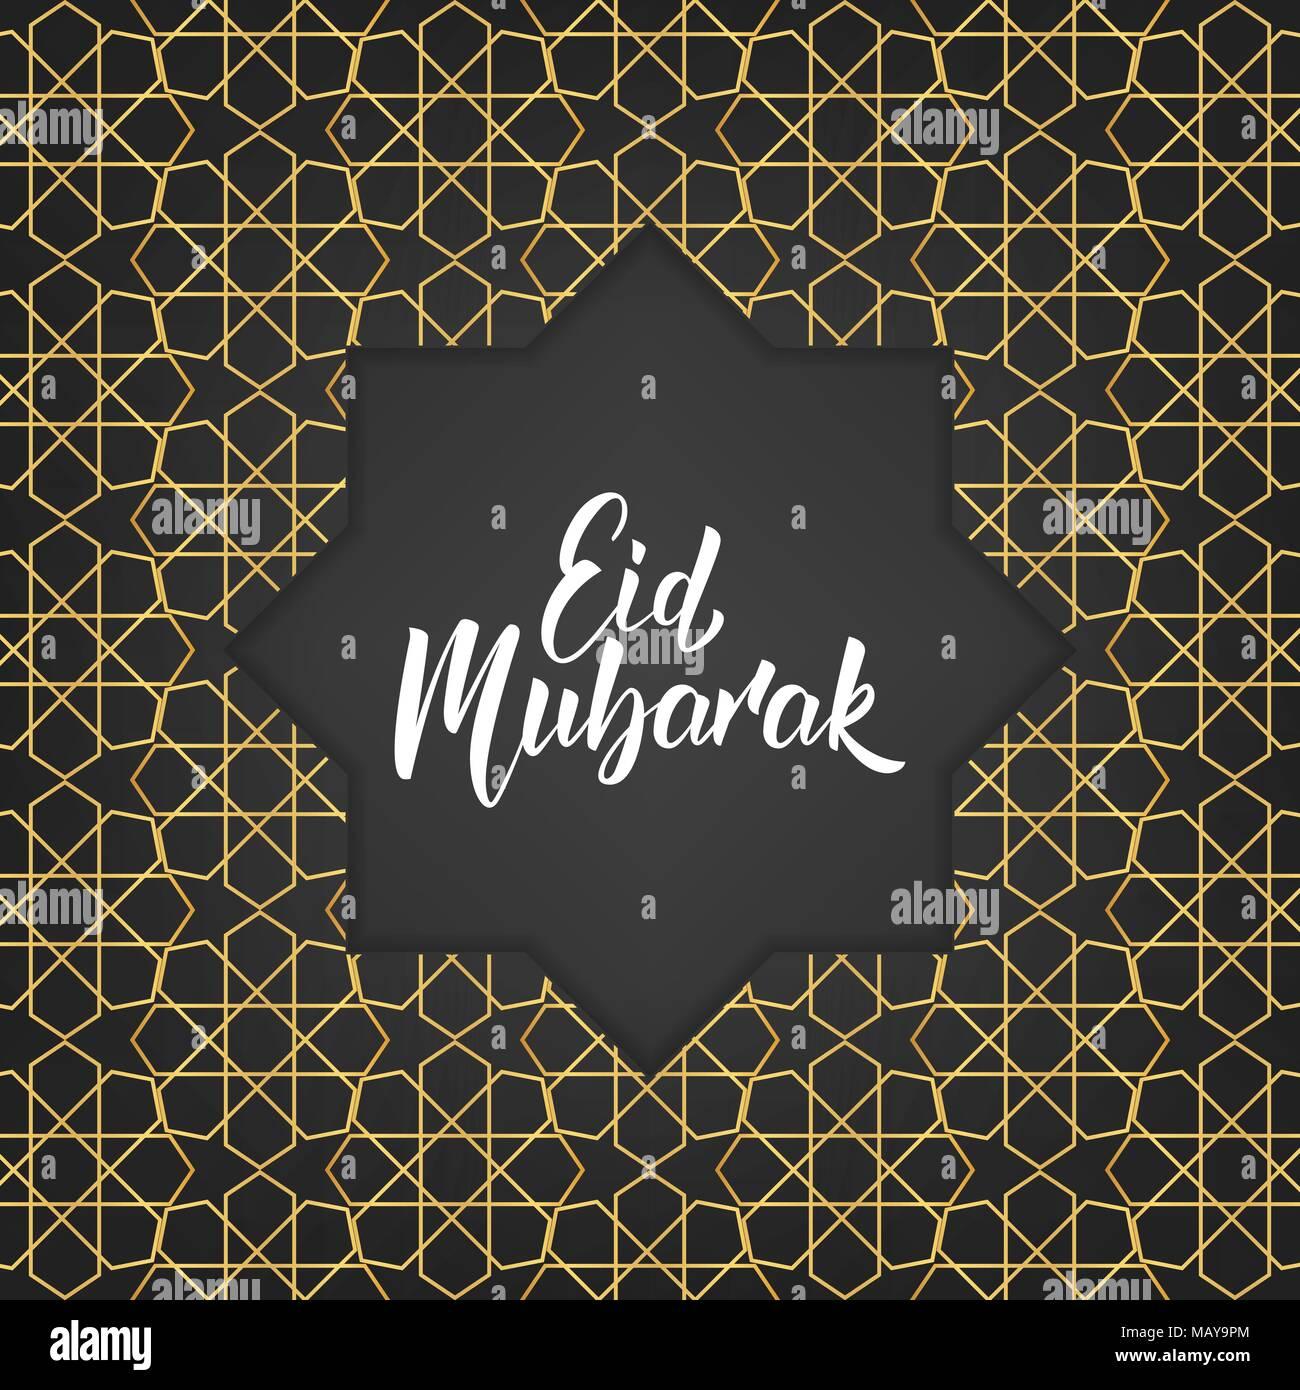 Eid Mubarak Ramadan Islamic Background Gold Arabesque Pattern And Lettering Calligraphy Stock Vector Image Art Alamy